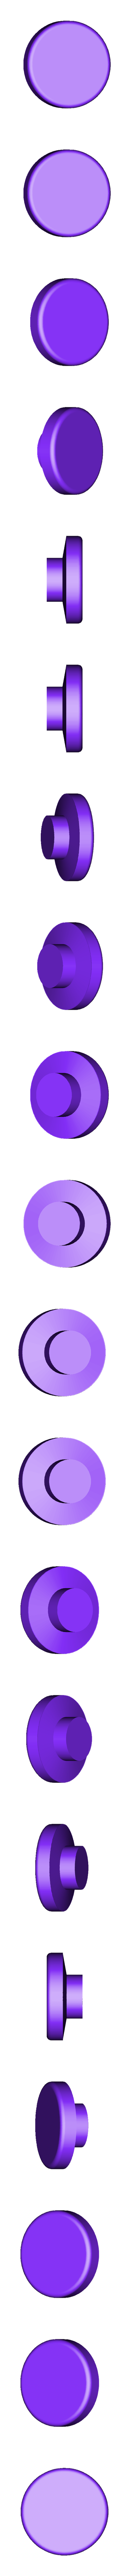 Button.stl Download free STL file Super Smash Brothers Amiibo Capsule • Template to 3D print, Make-Do